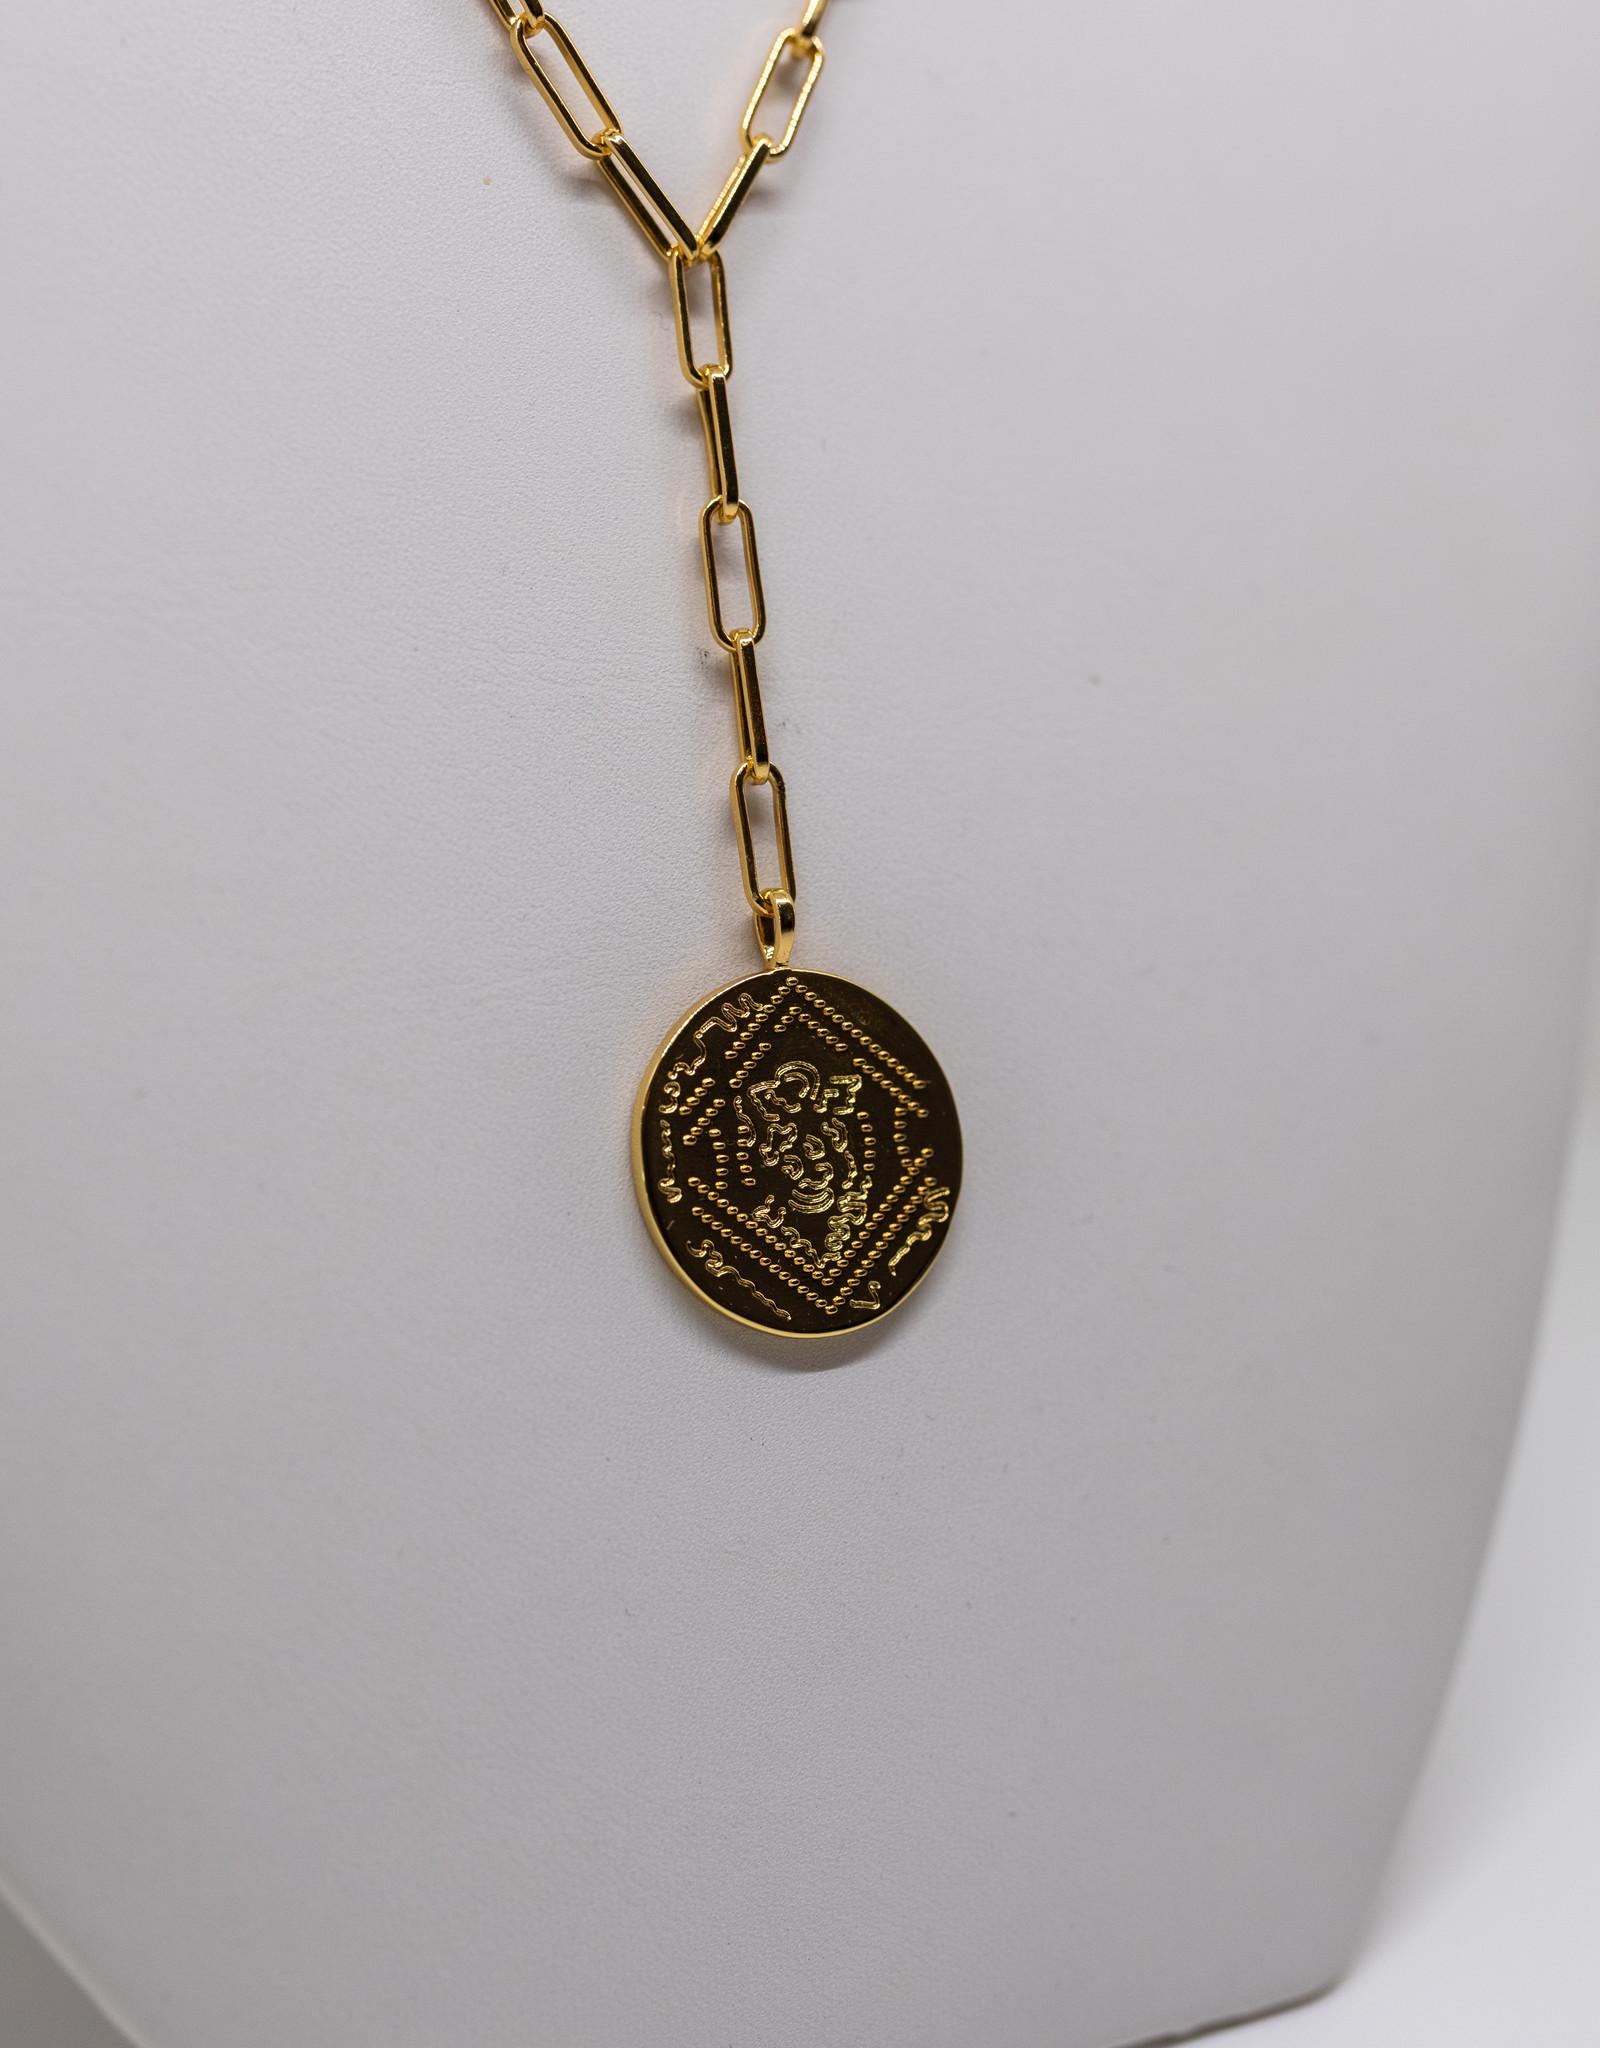 Gorjana Ana Coin Lariat Gold